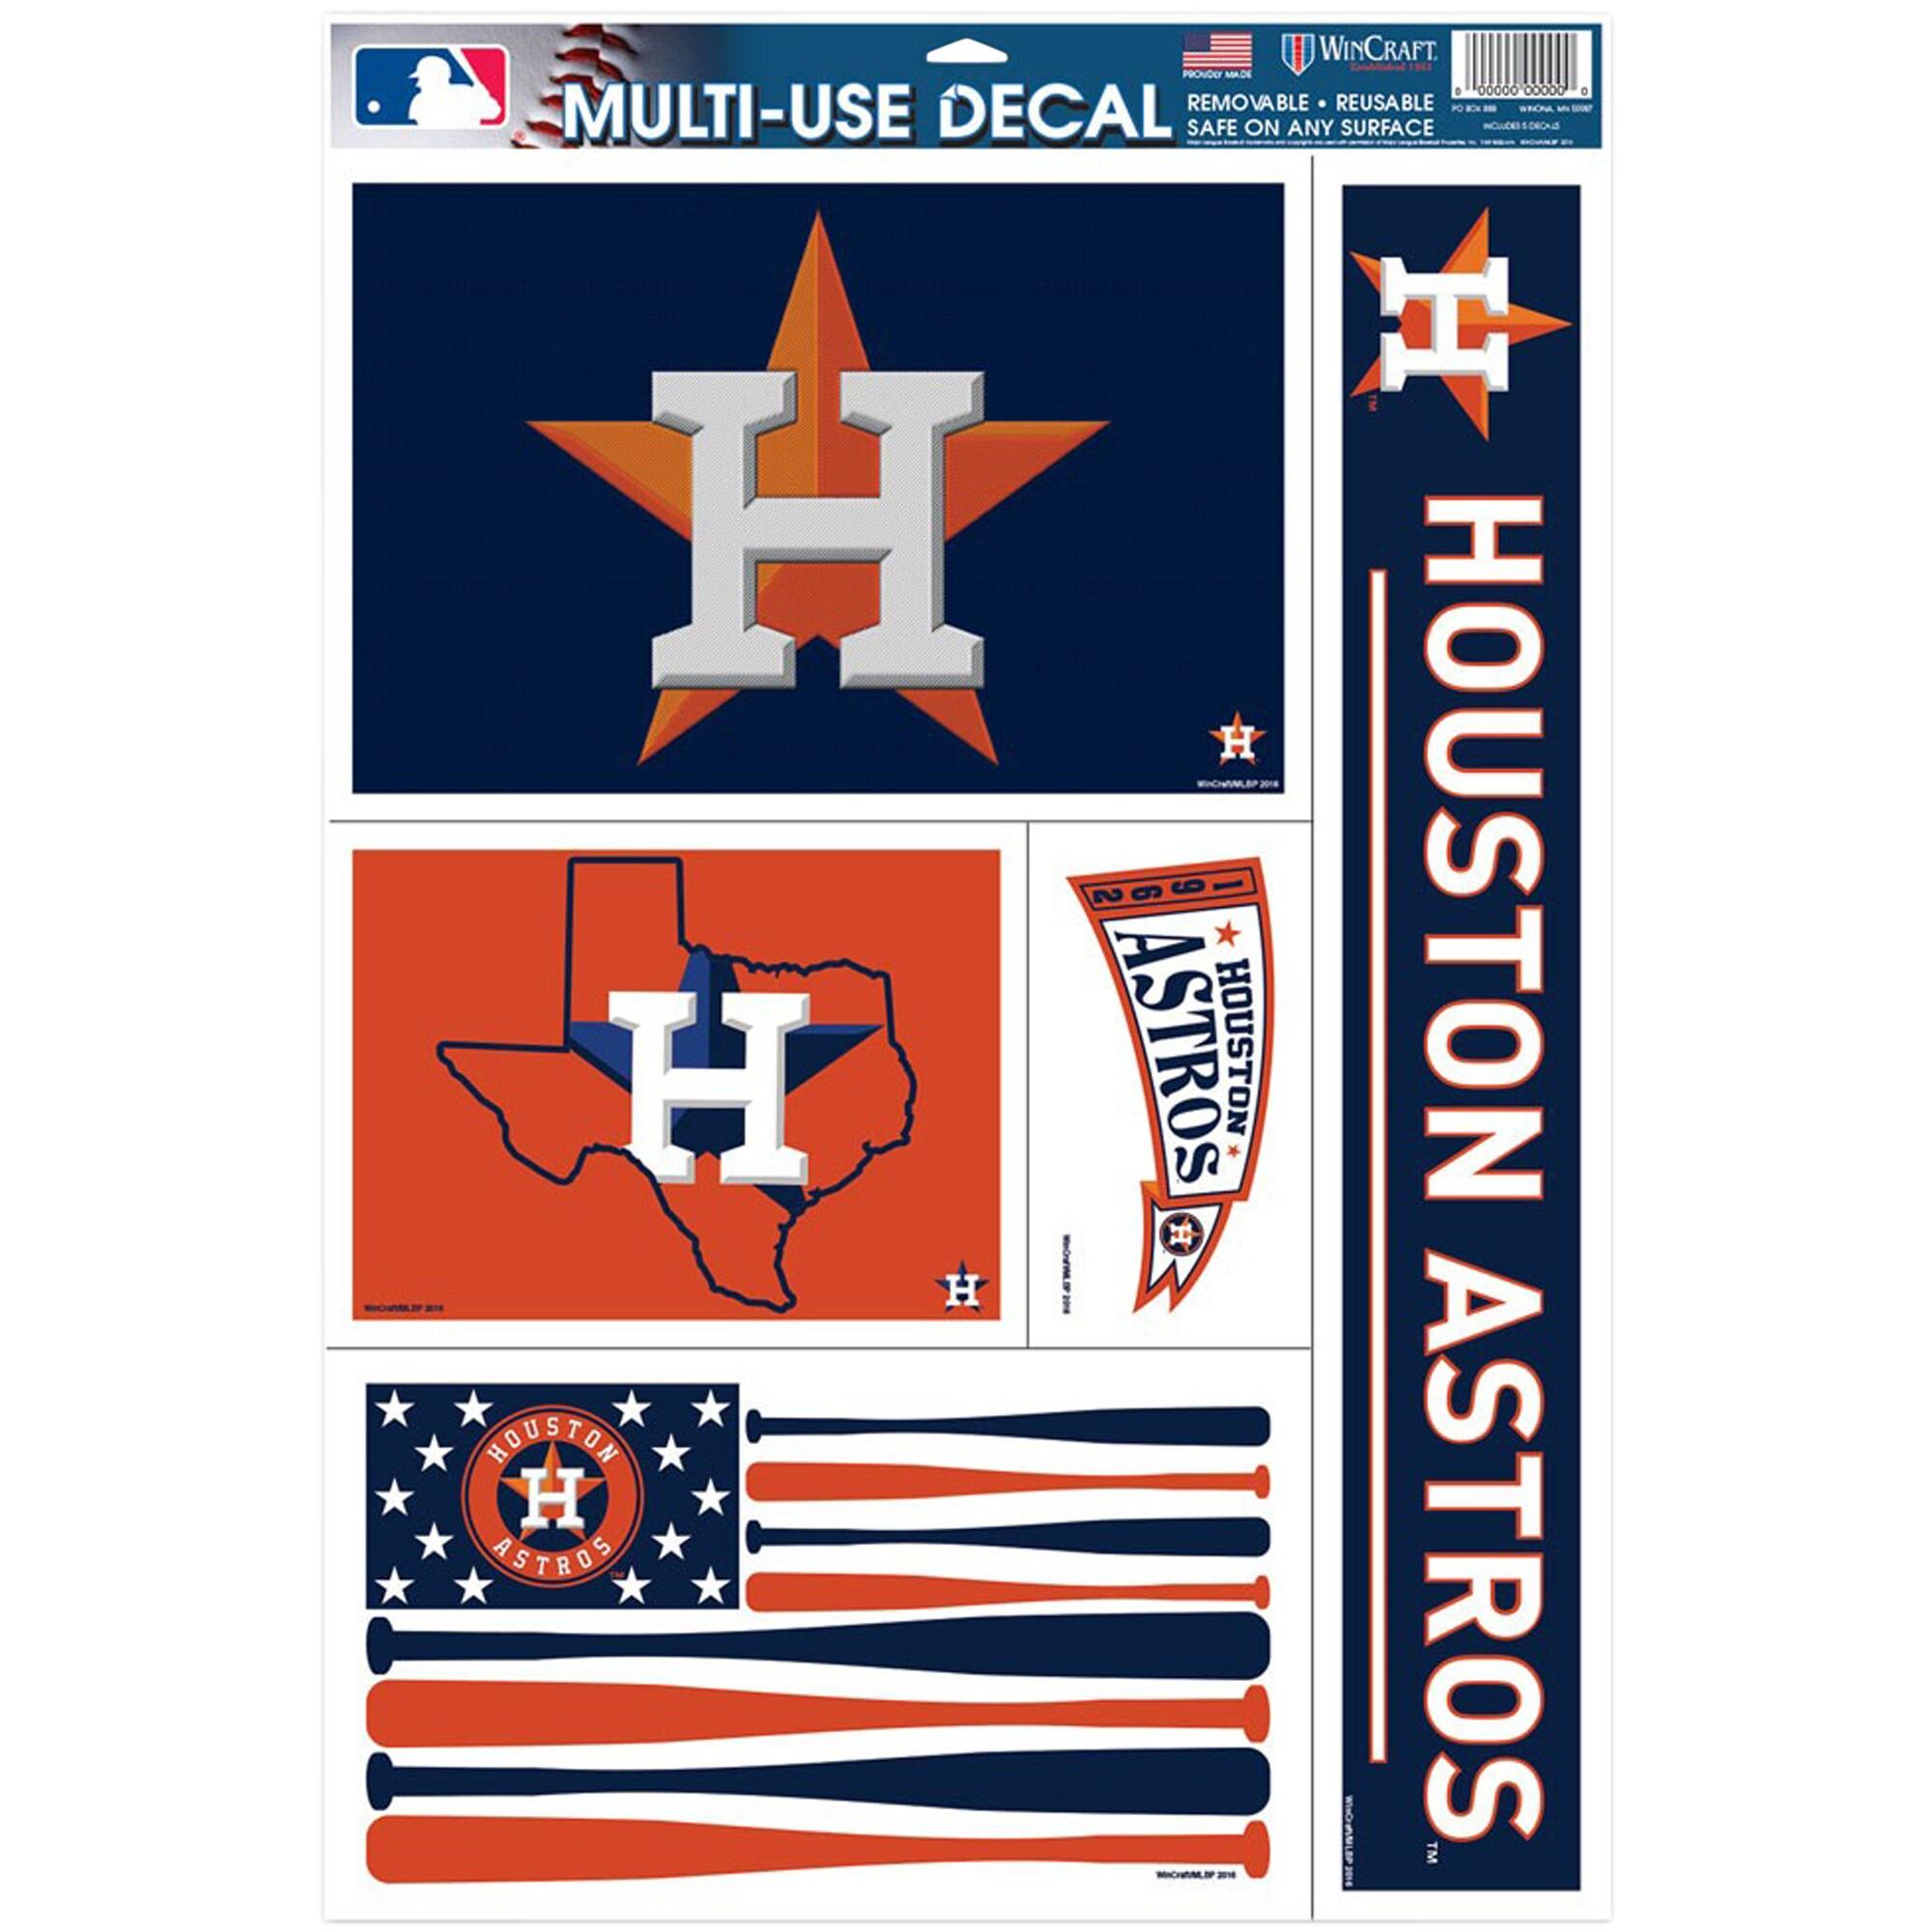 "Houston Astros WinCraft 11"" x 17"" Multi-Use Decal Sheet"